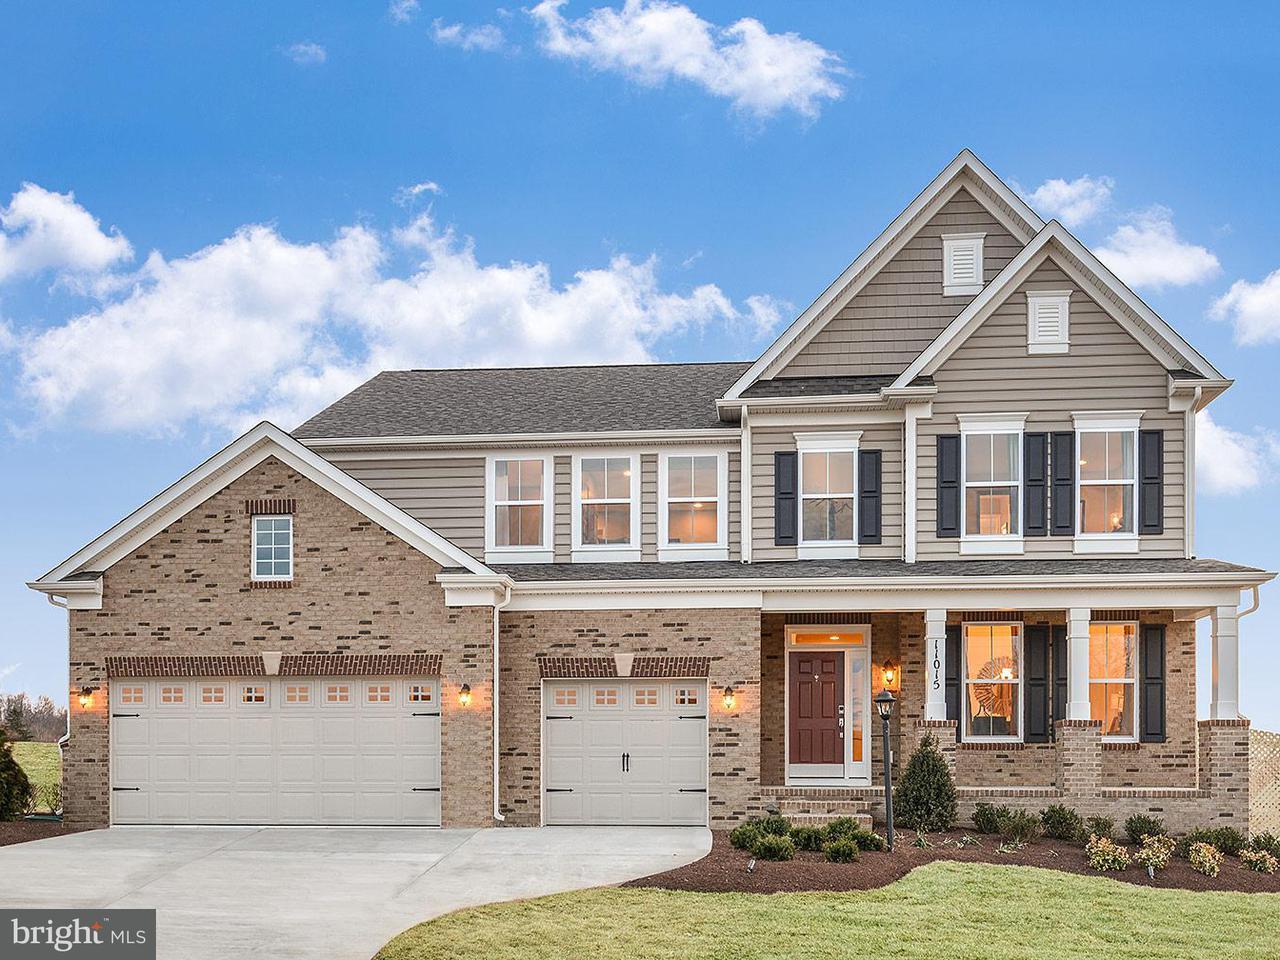 Single Family Home for Sale at 11007 Tinder Box Way 11007 Tinder Box Way Monrovia, Maryland 21770 United States